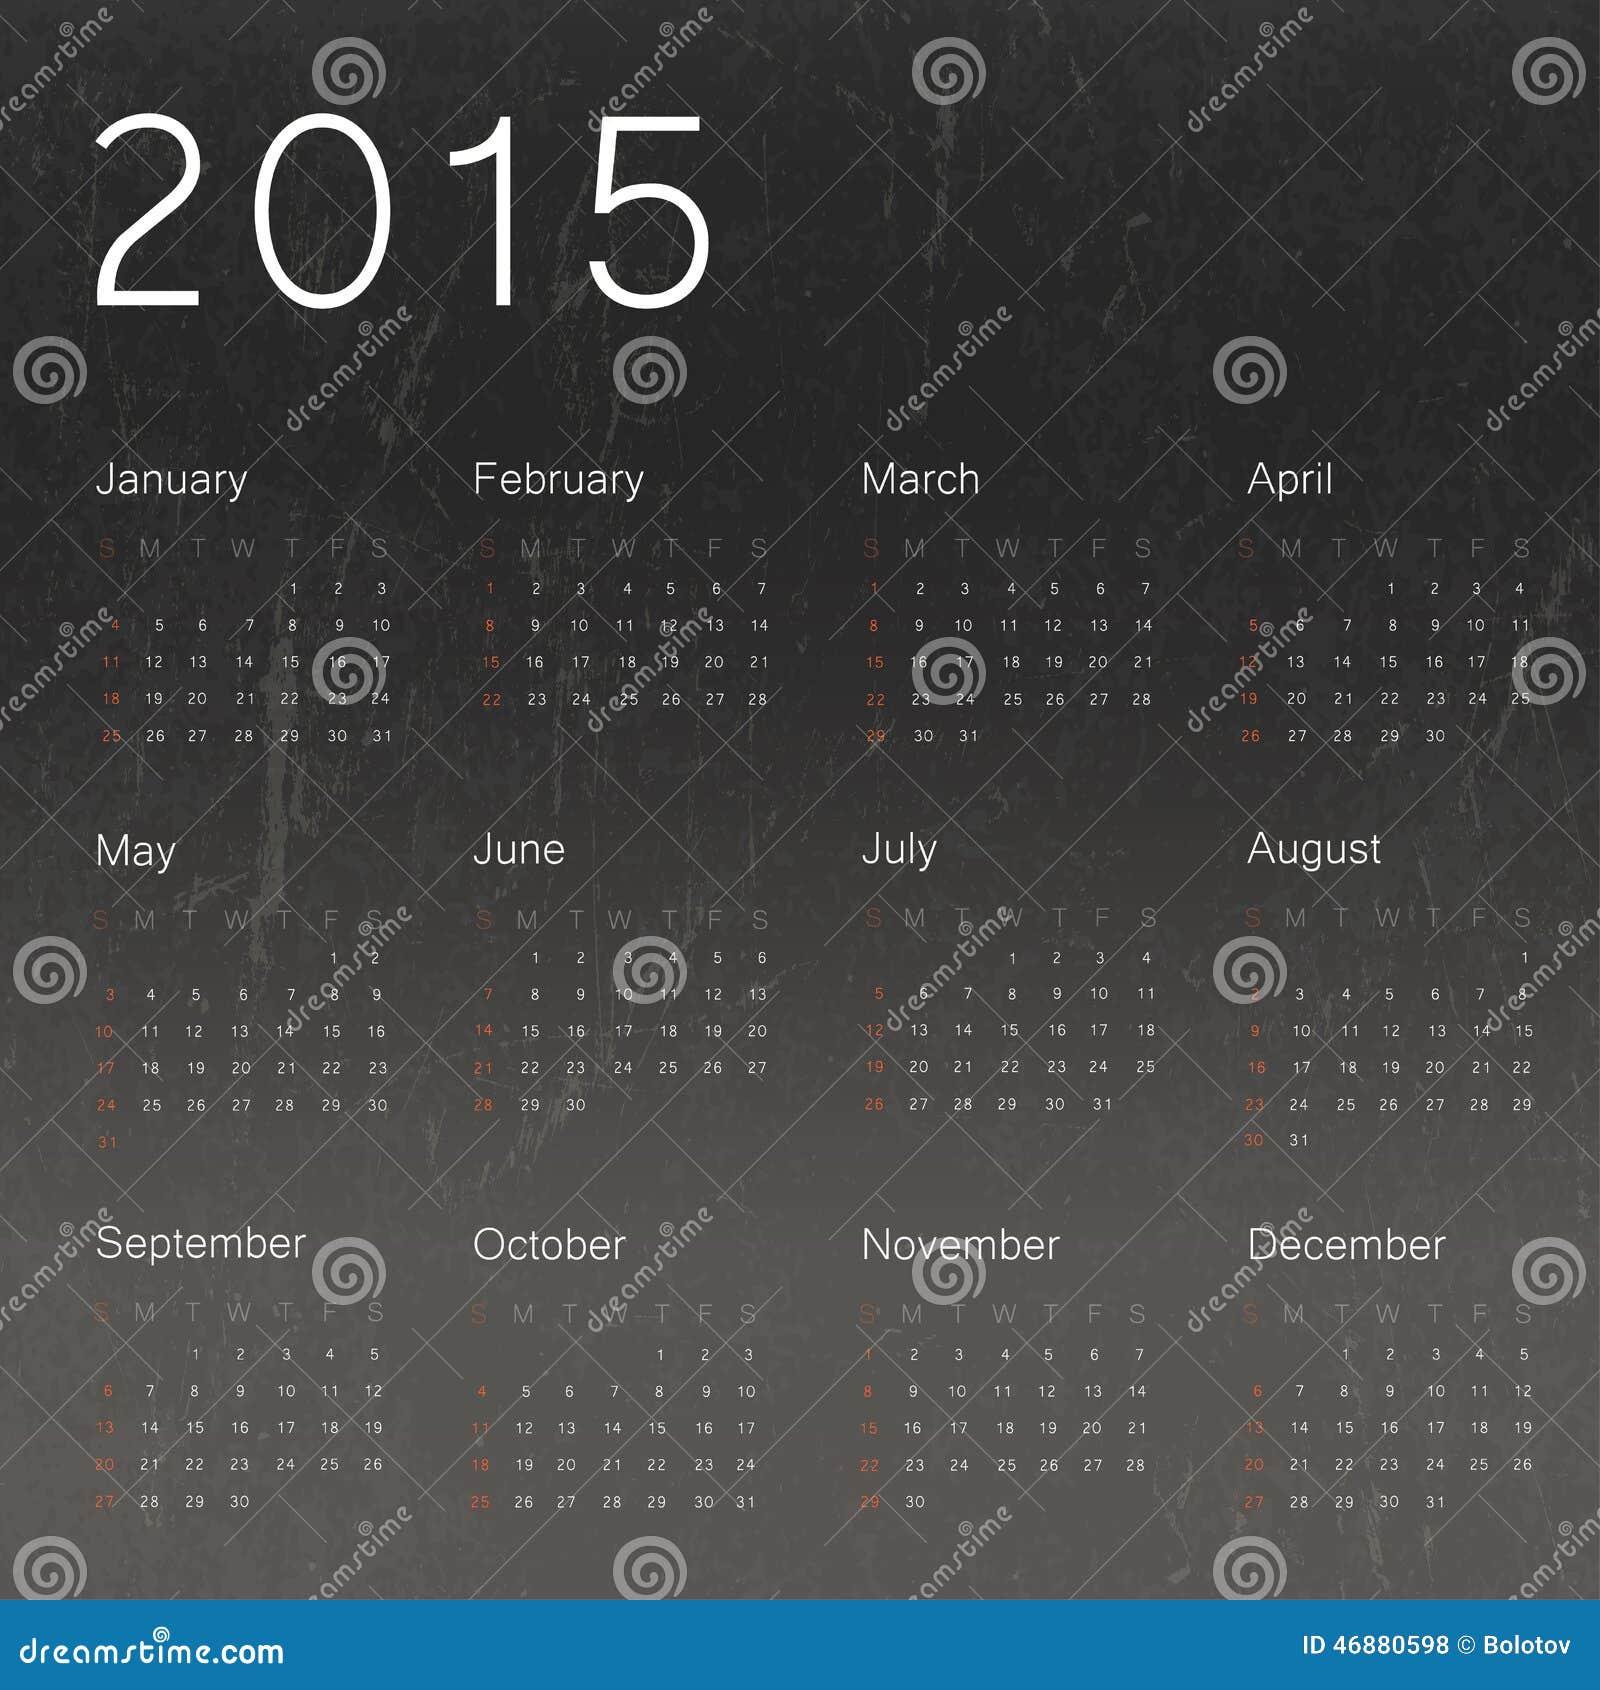 Calendar Background Vector : Calendar on black chalkboard background stock vector